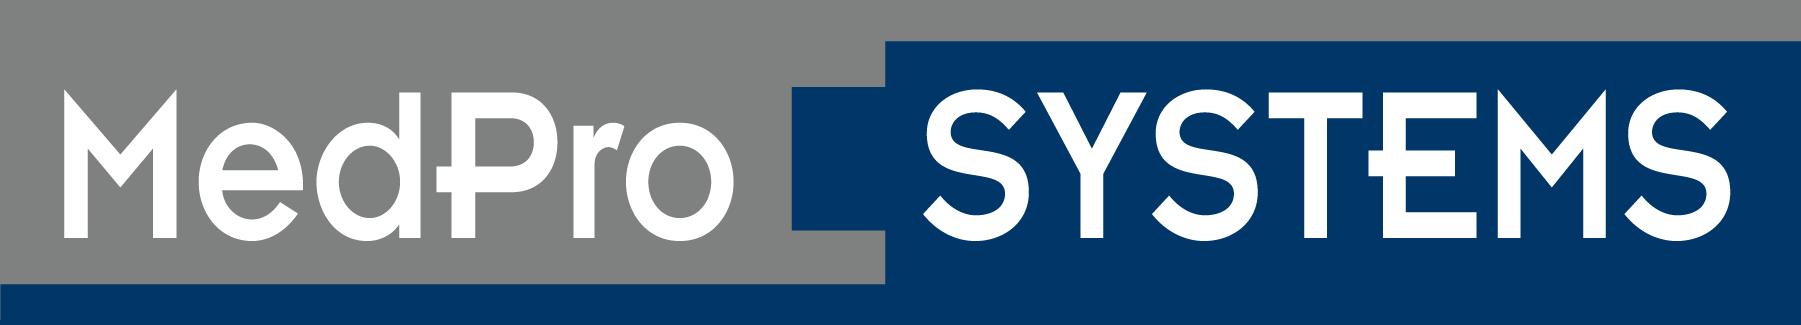 MedPro Systems Logo